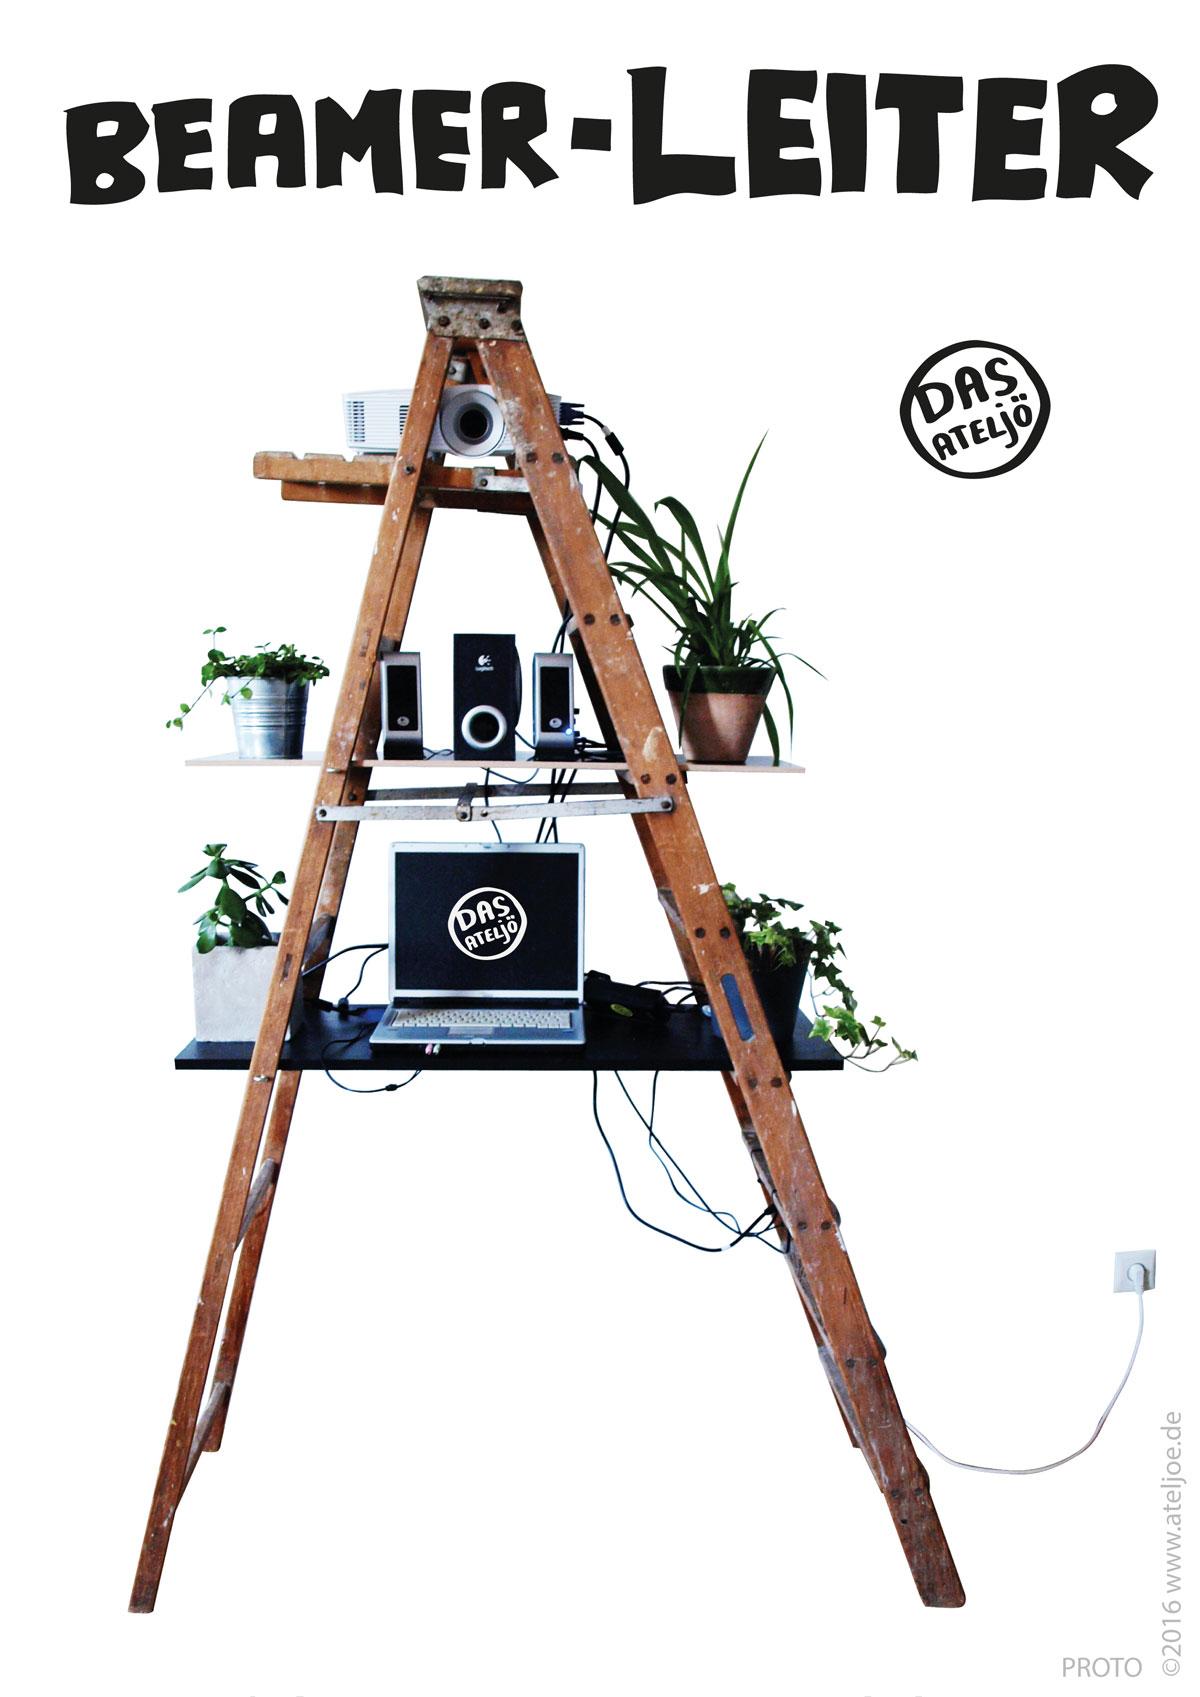 selbstgebautes Beamer-Leiter-Regal